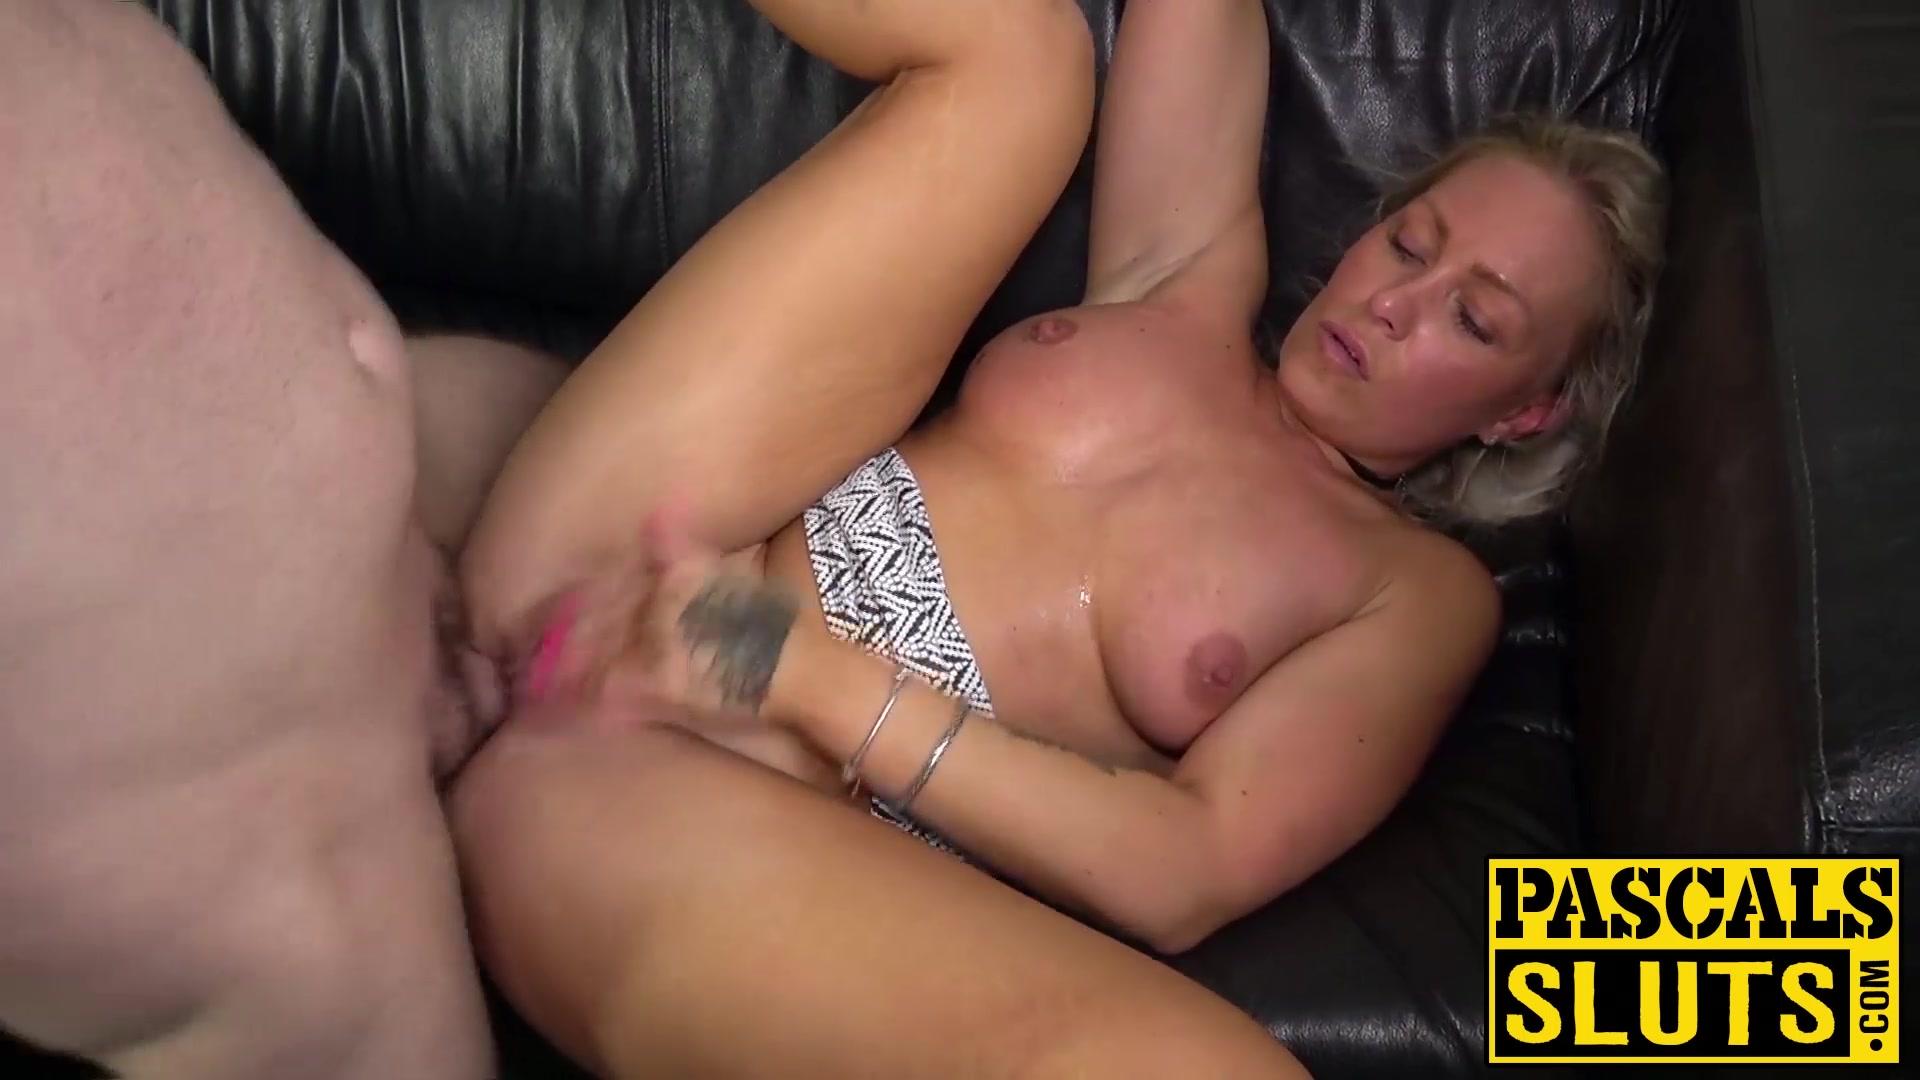 Sexy Photo Bbw latina mature pics